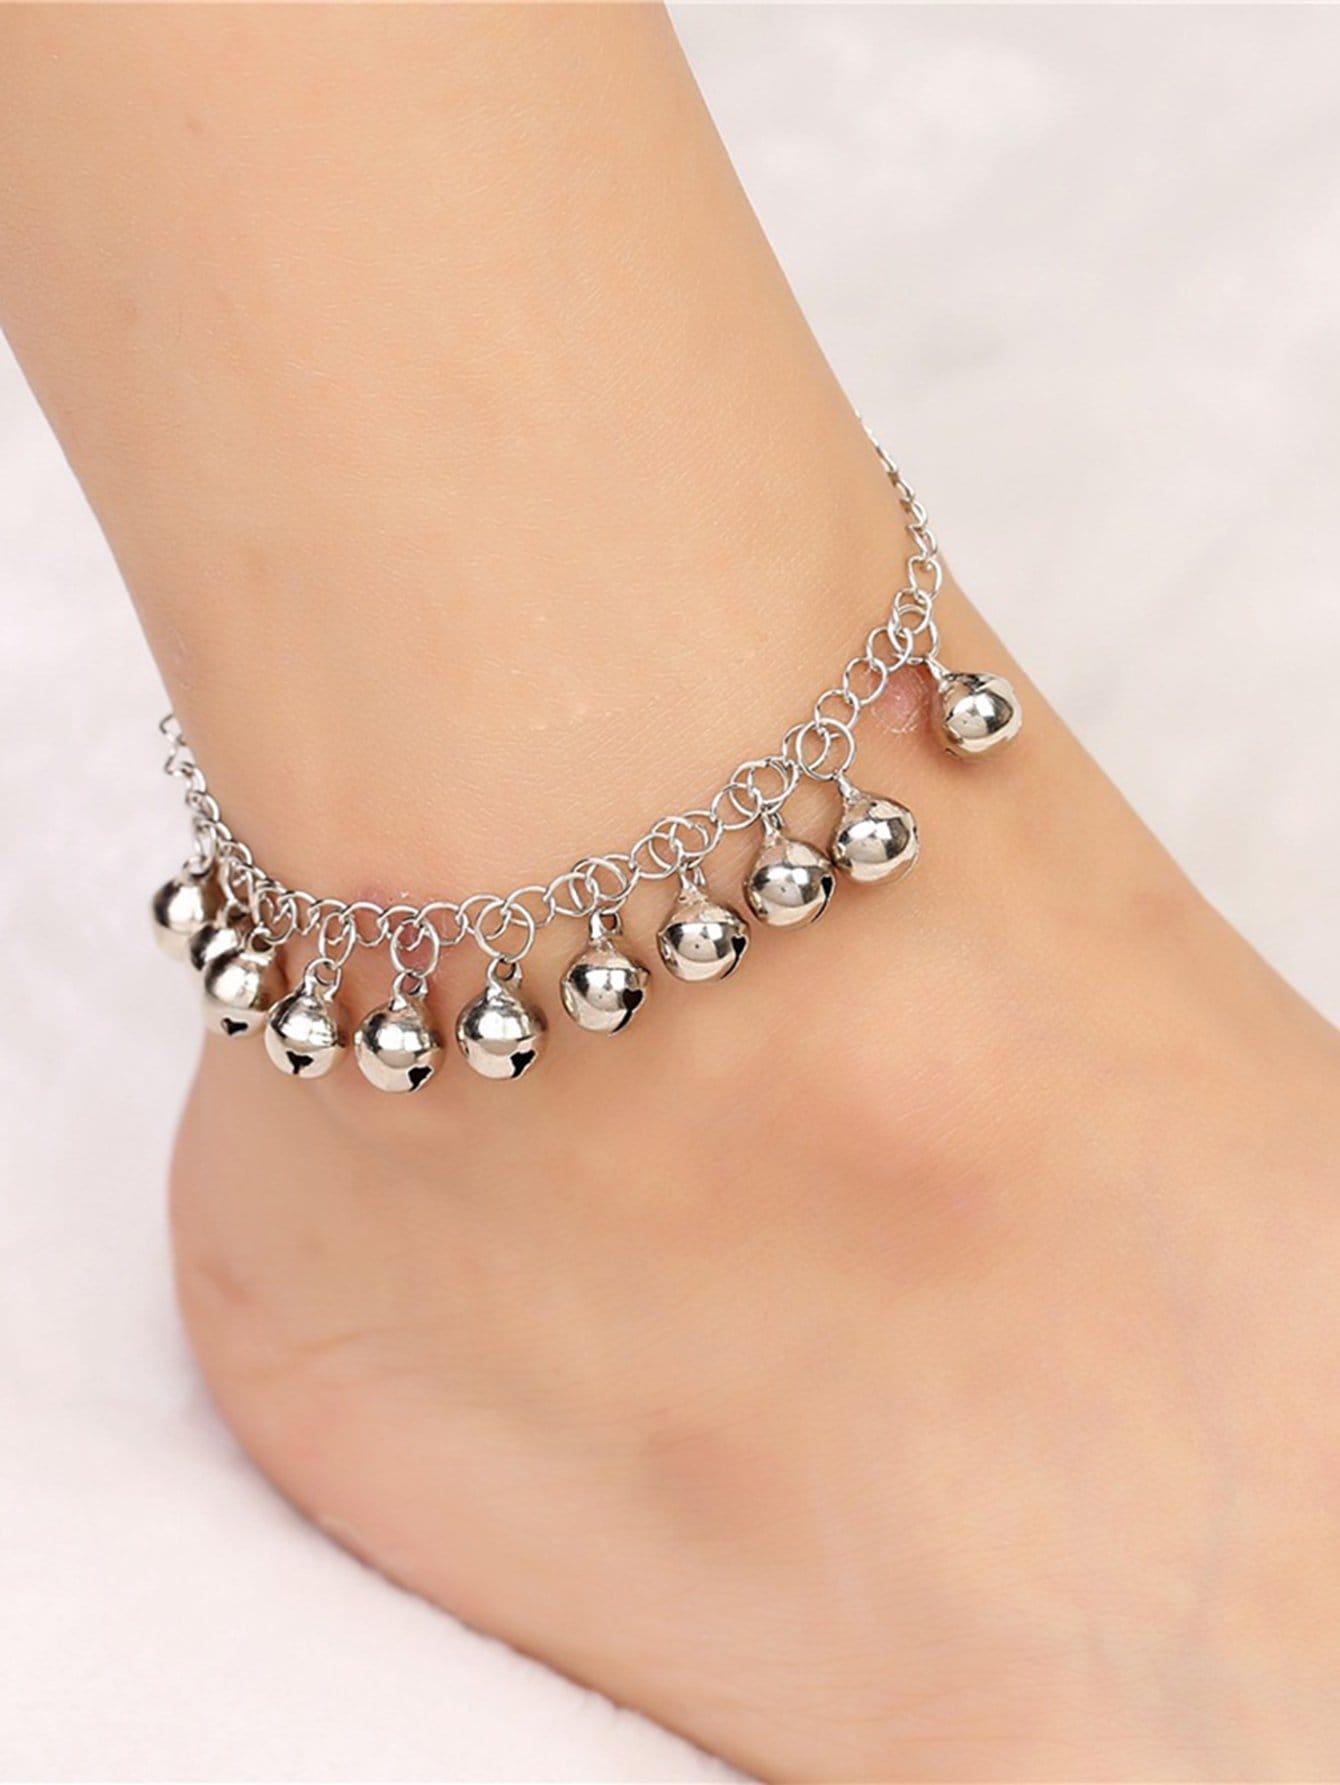 Bell Charm Design Chain Anklet